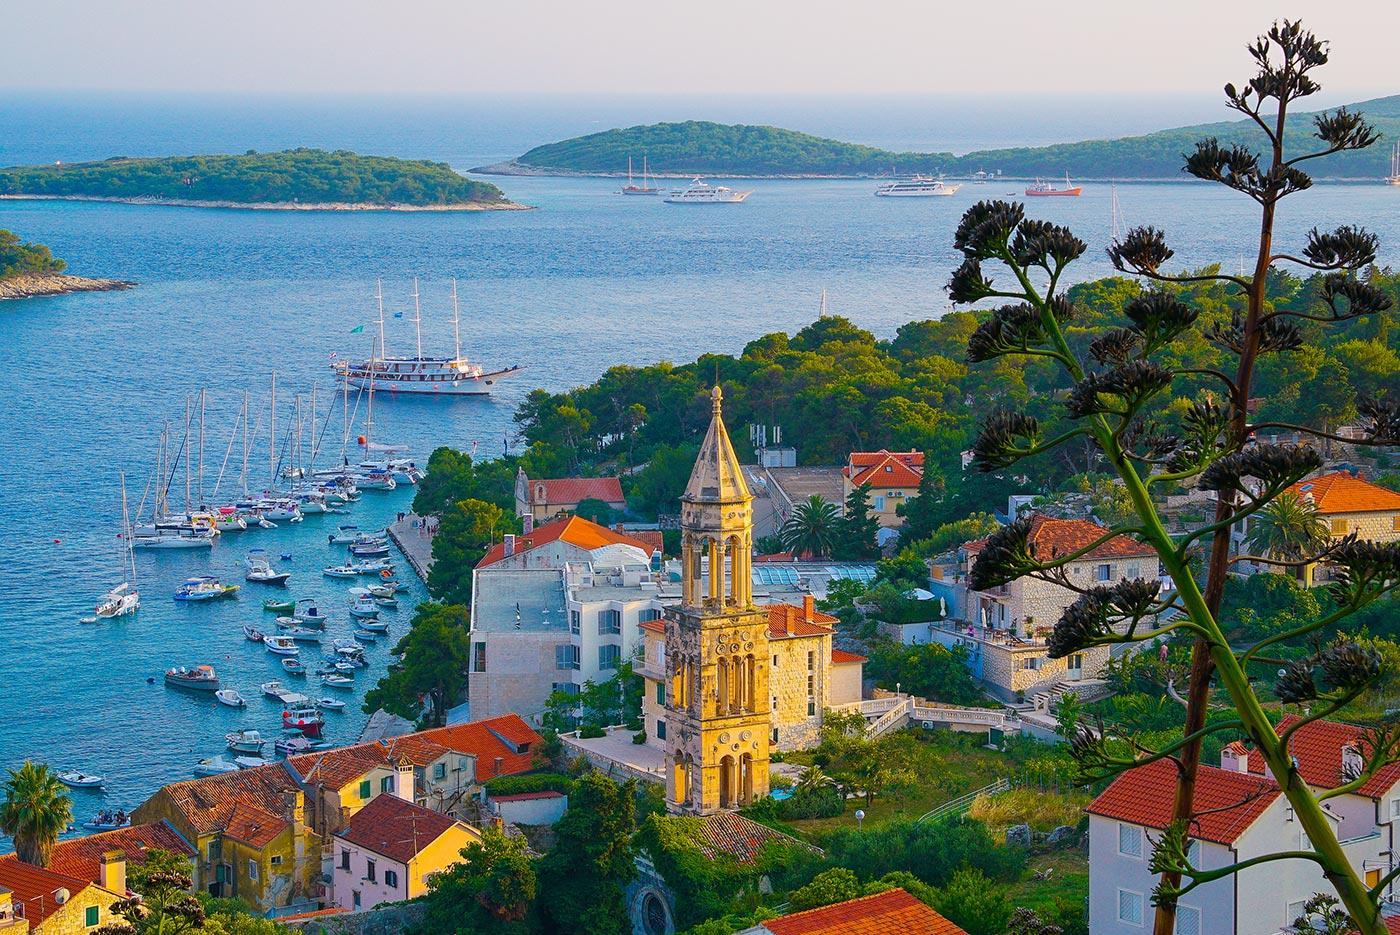 Sailing routes in Croatia